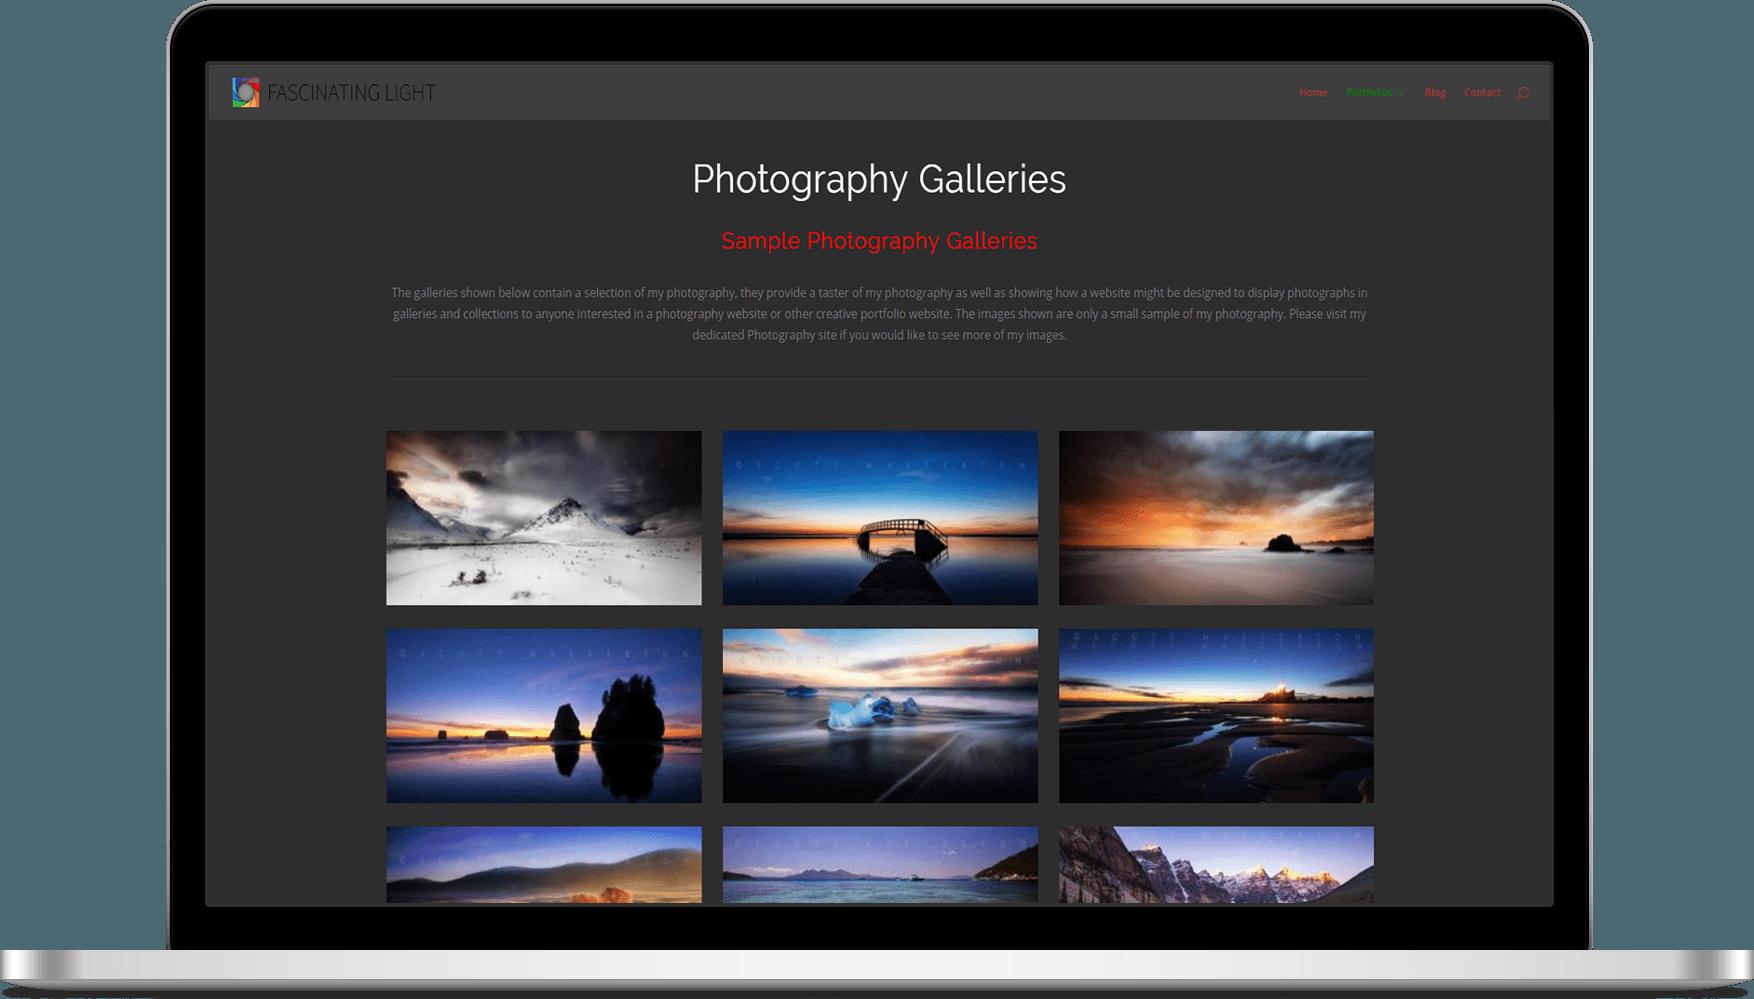 Website | Personal | Fascinating Light